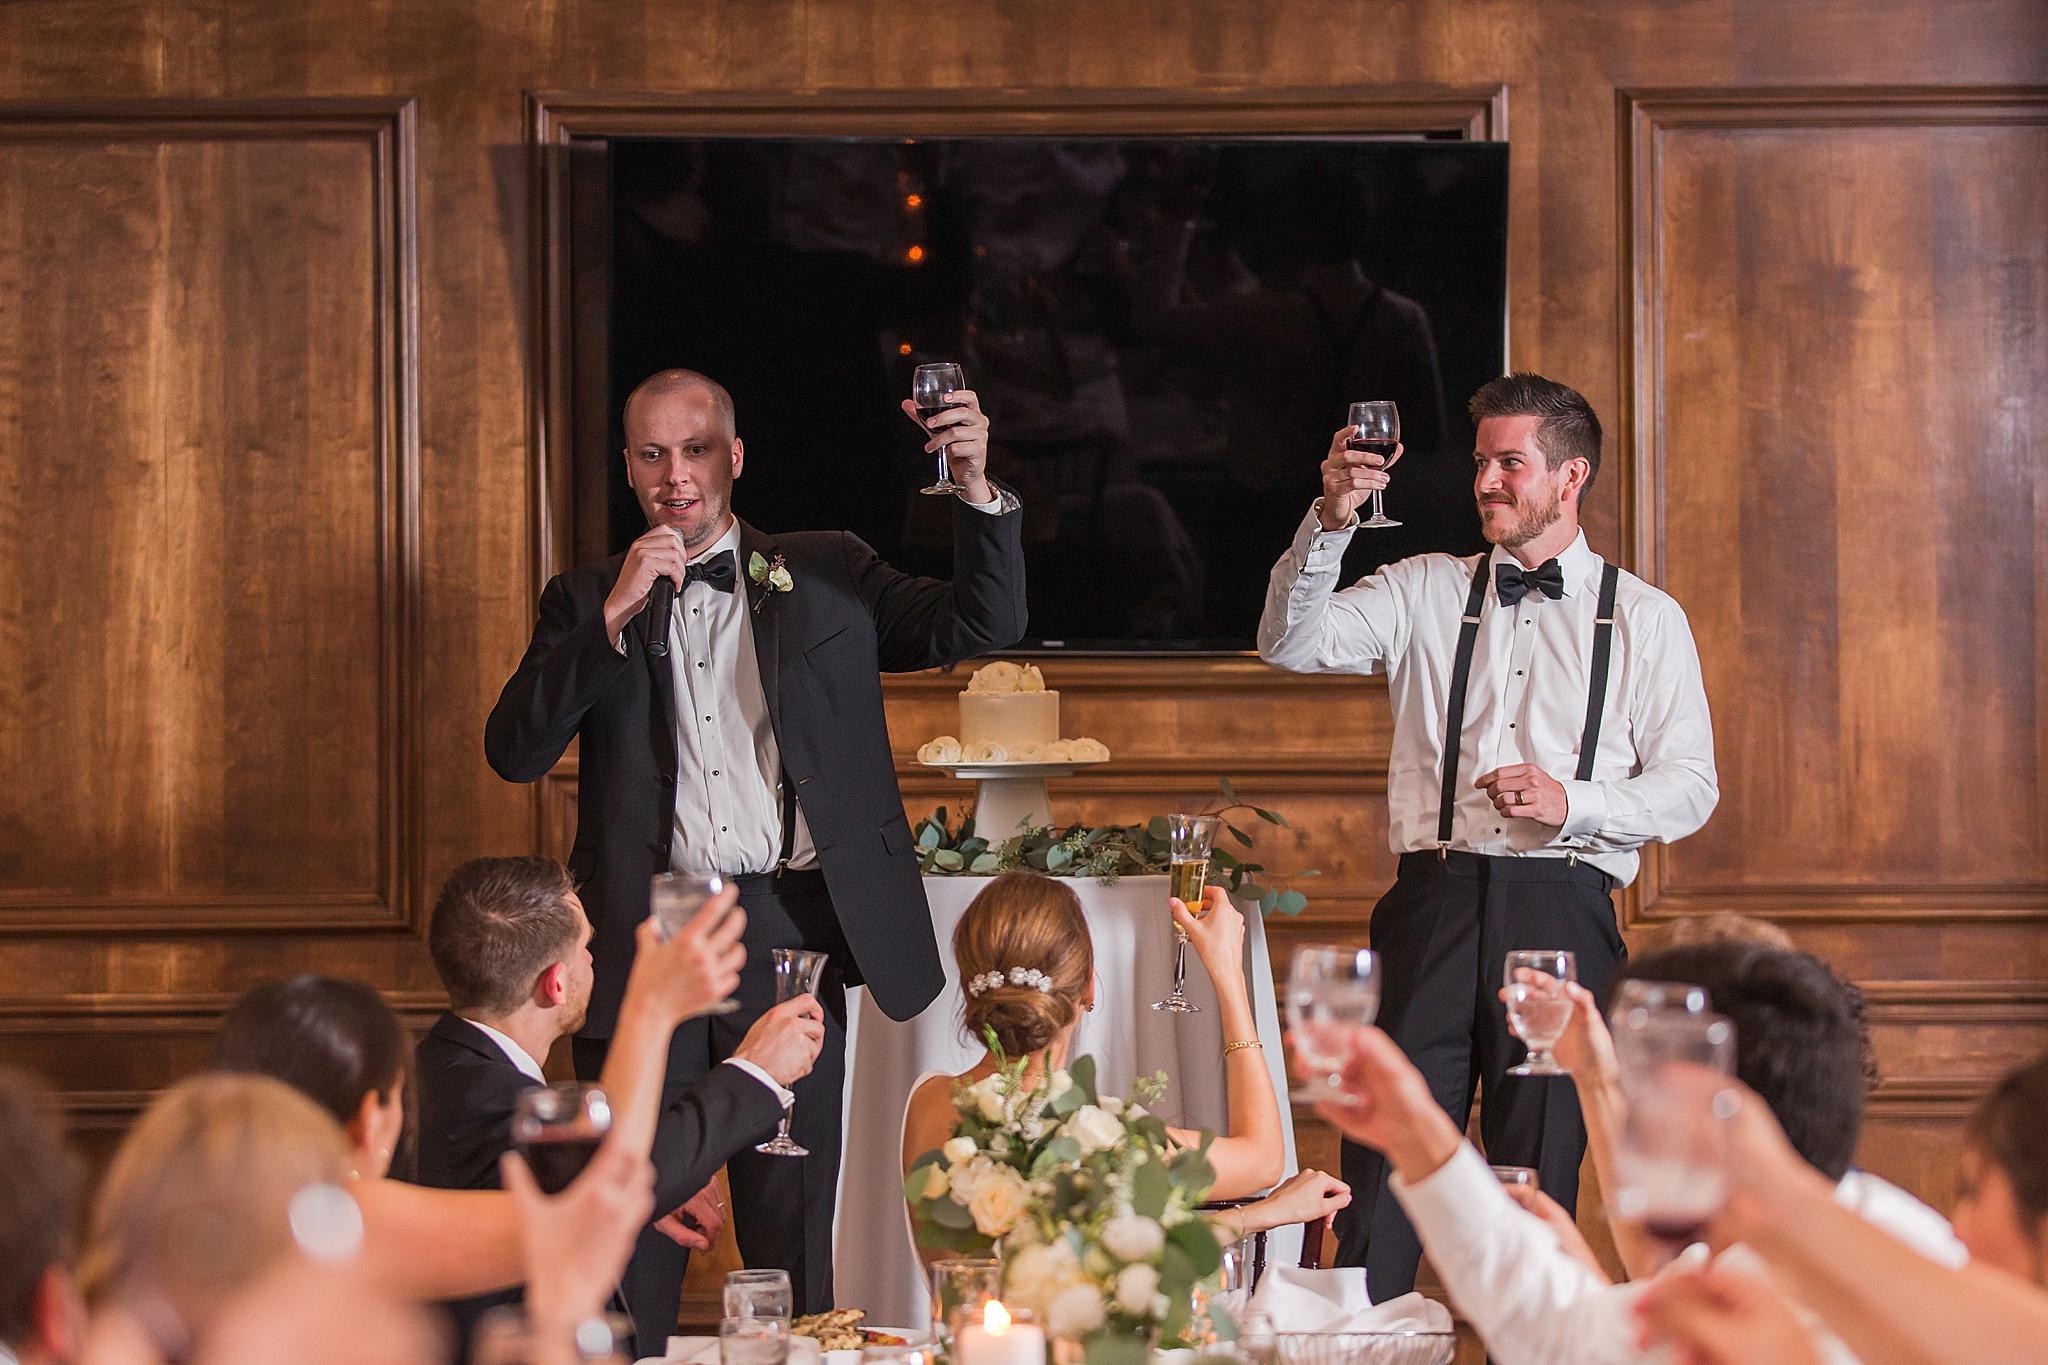 detroit-wedding-photographer-grosse-pointe-academy-chapel-detroit-golf-club-wedding-carly-matt-by-courtney-carolyn-photography_0103.jpg